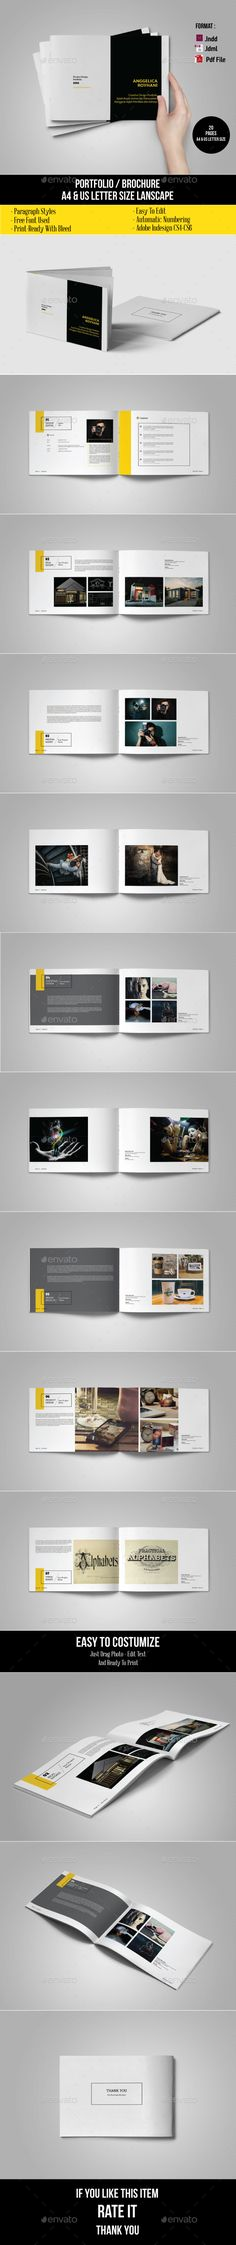 Minimal Multipurpose Portfolio Brochure Template InDesign INDD #design Download: http://graphicriver.net/item/multipurpose-portfolio-template/14369404?ref=ksioks